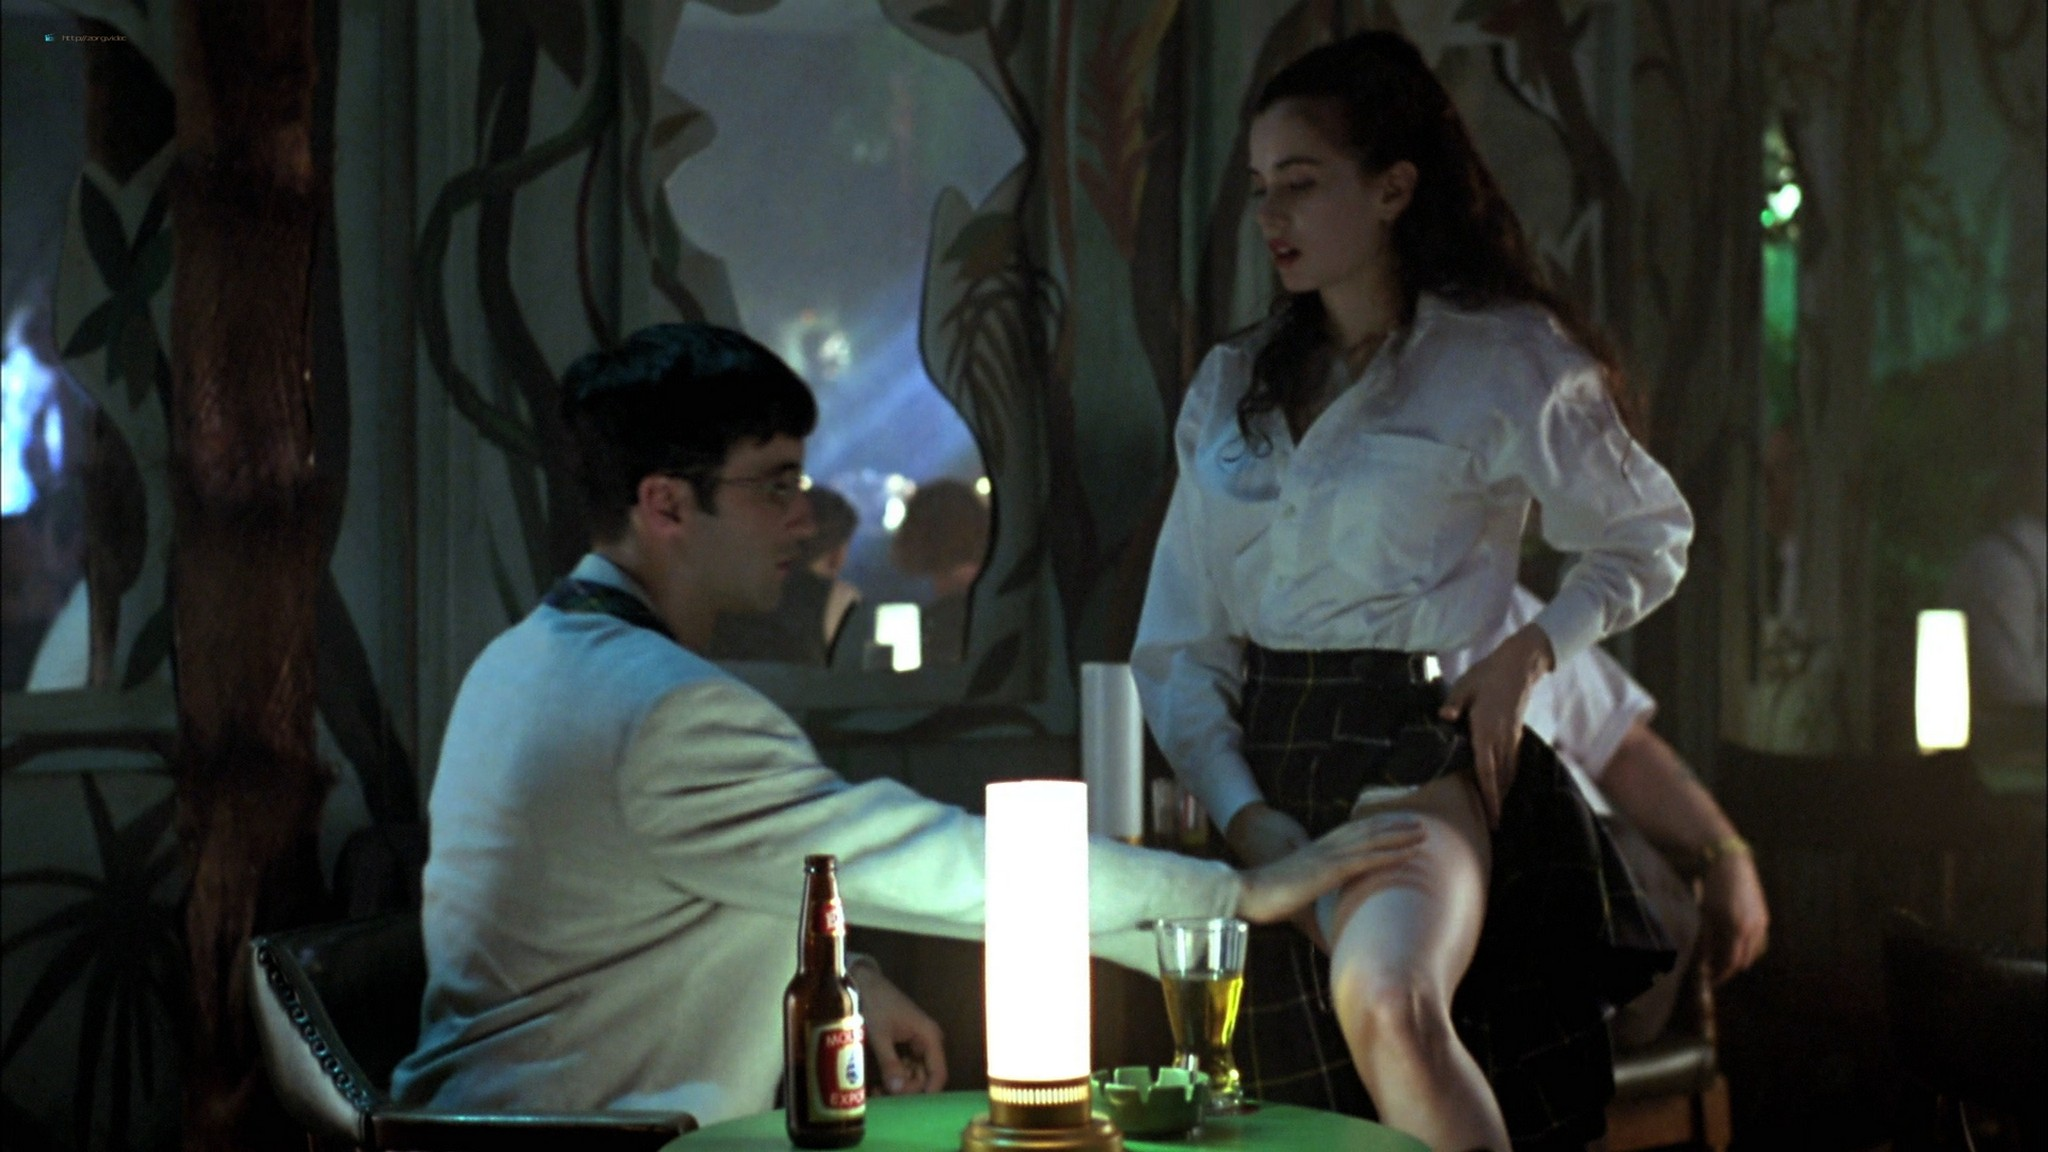 Mia Kirshner nude Arsinée Khanjian sexy - Exotica (1994) HD 1080p BluRay REMUX (4)